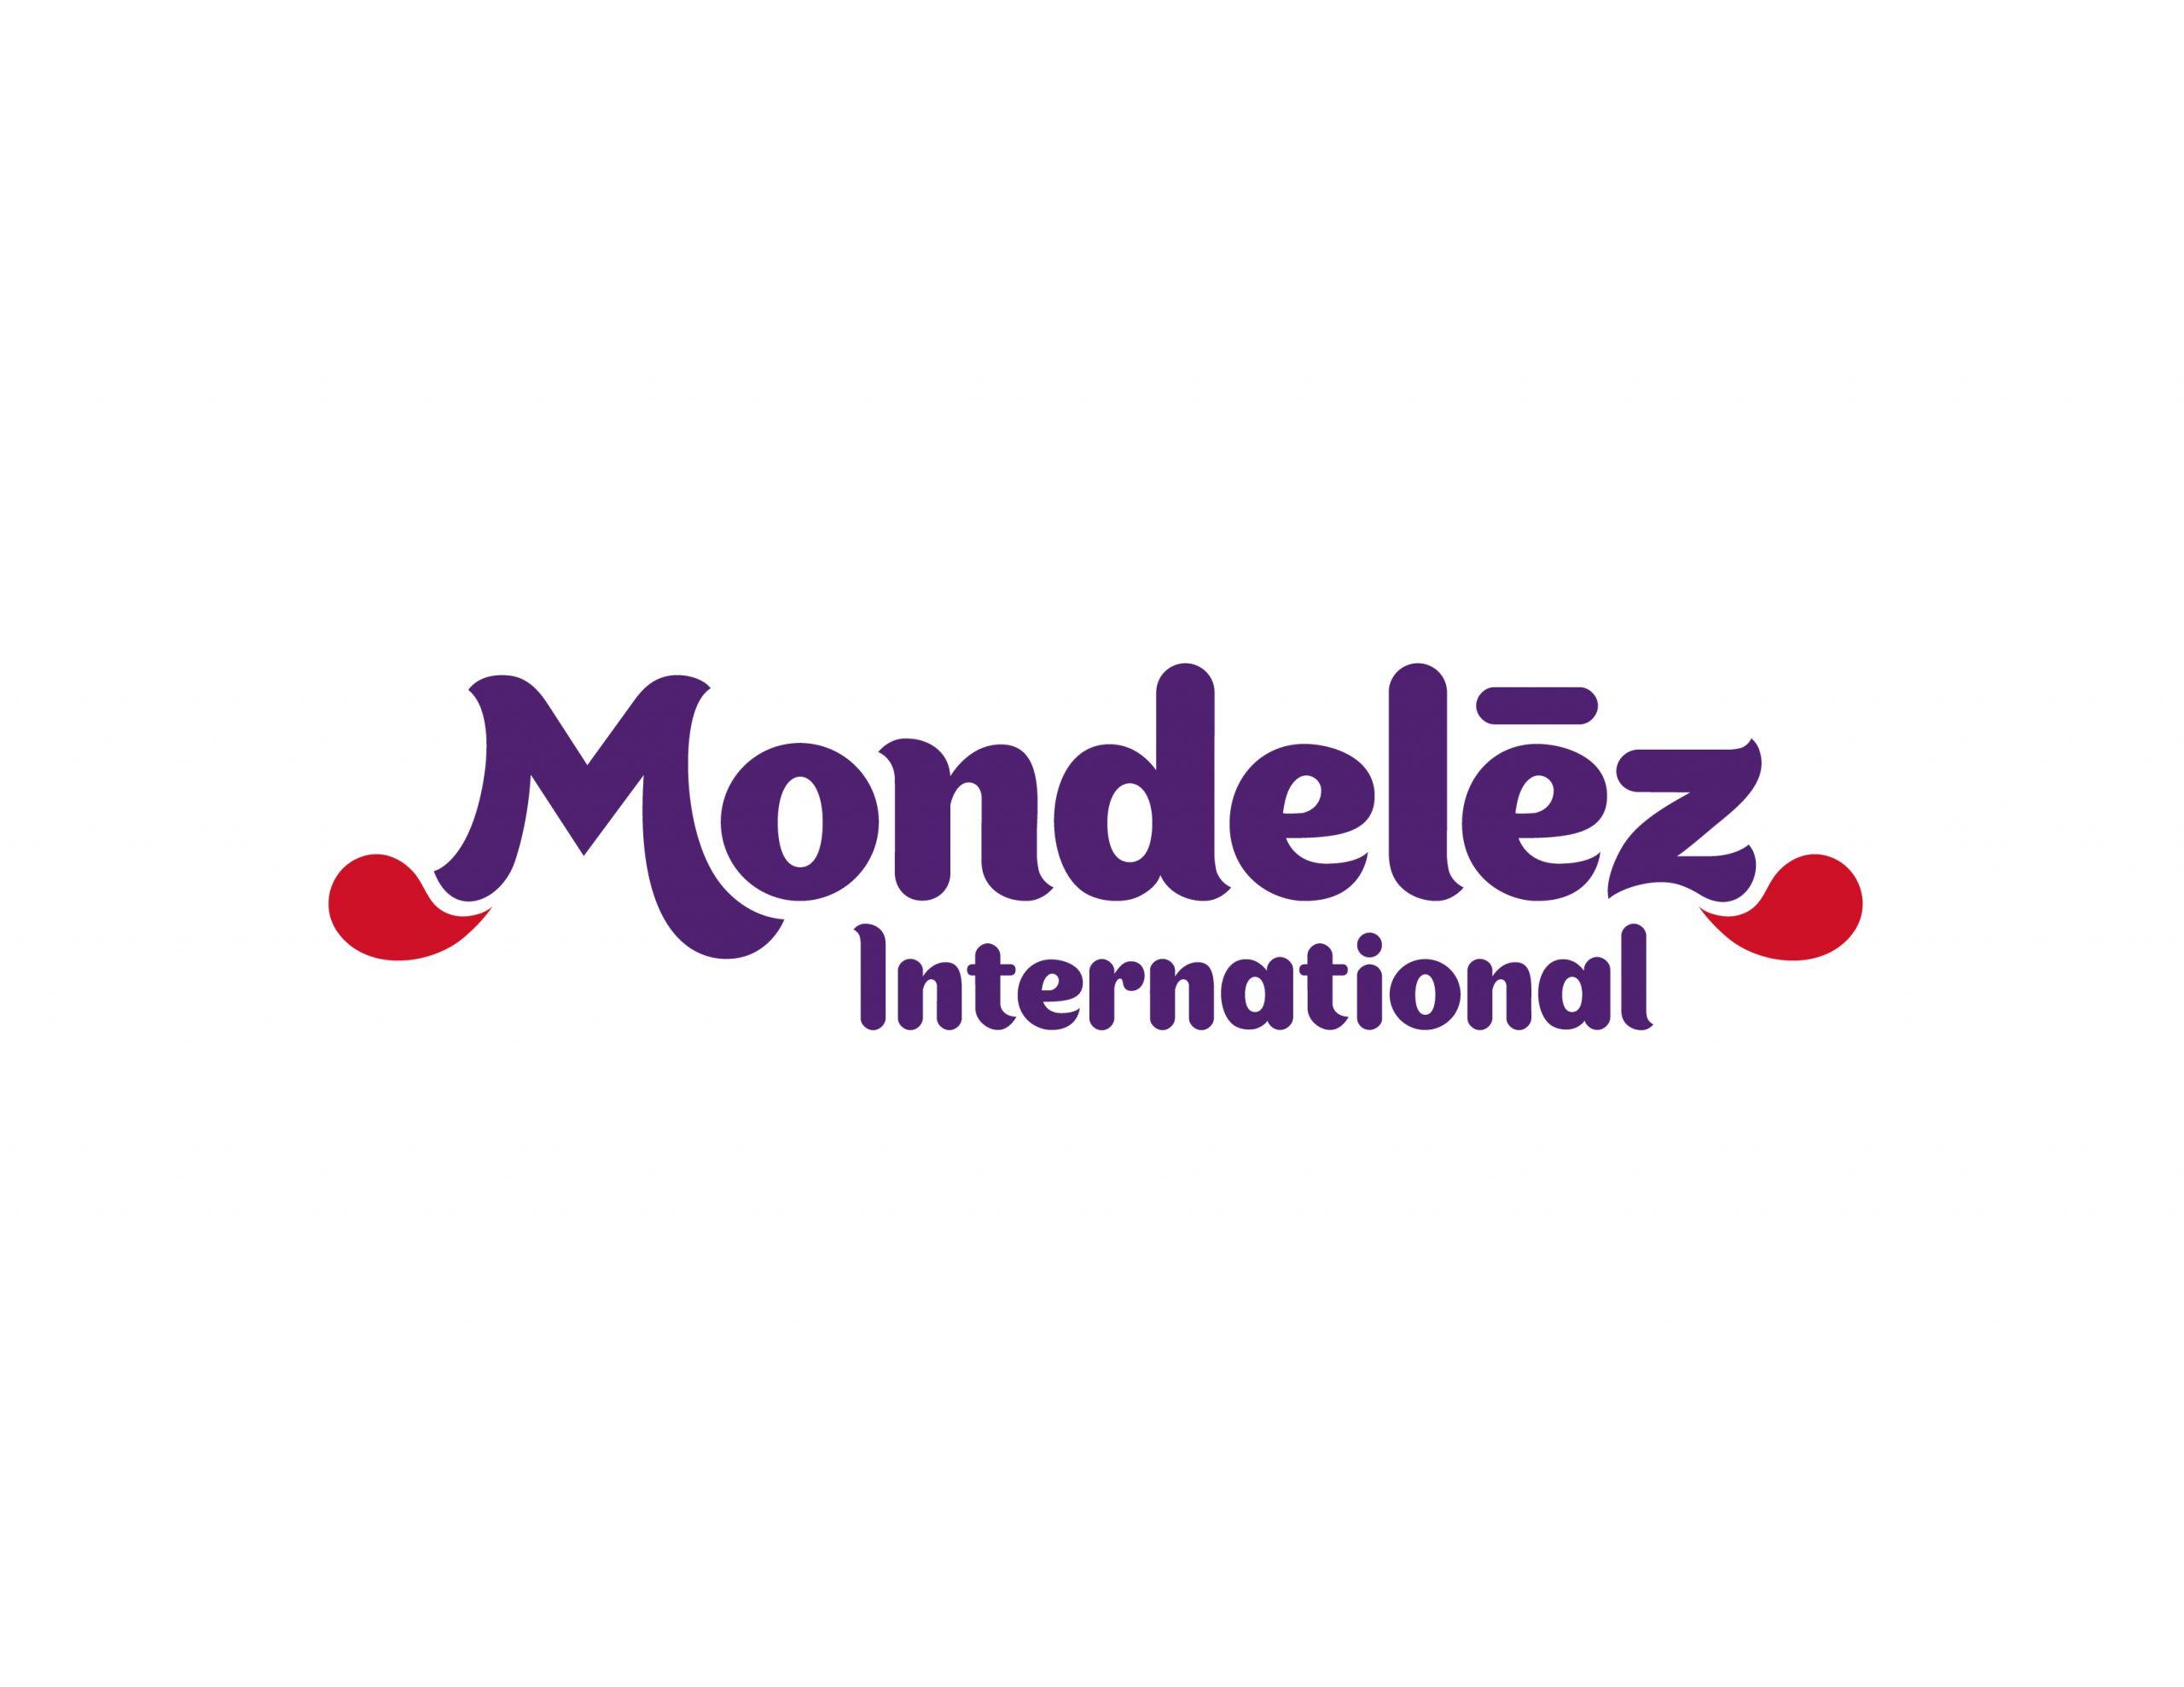 BPA signs Mondelez International as sponsor as part of one year on celebrations